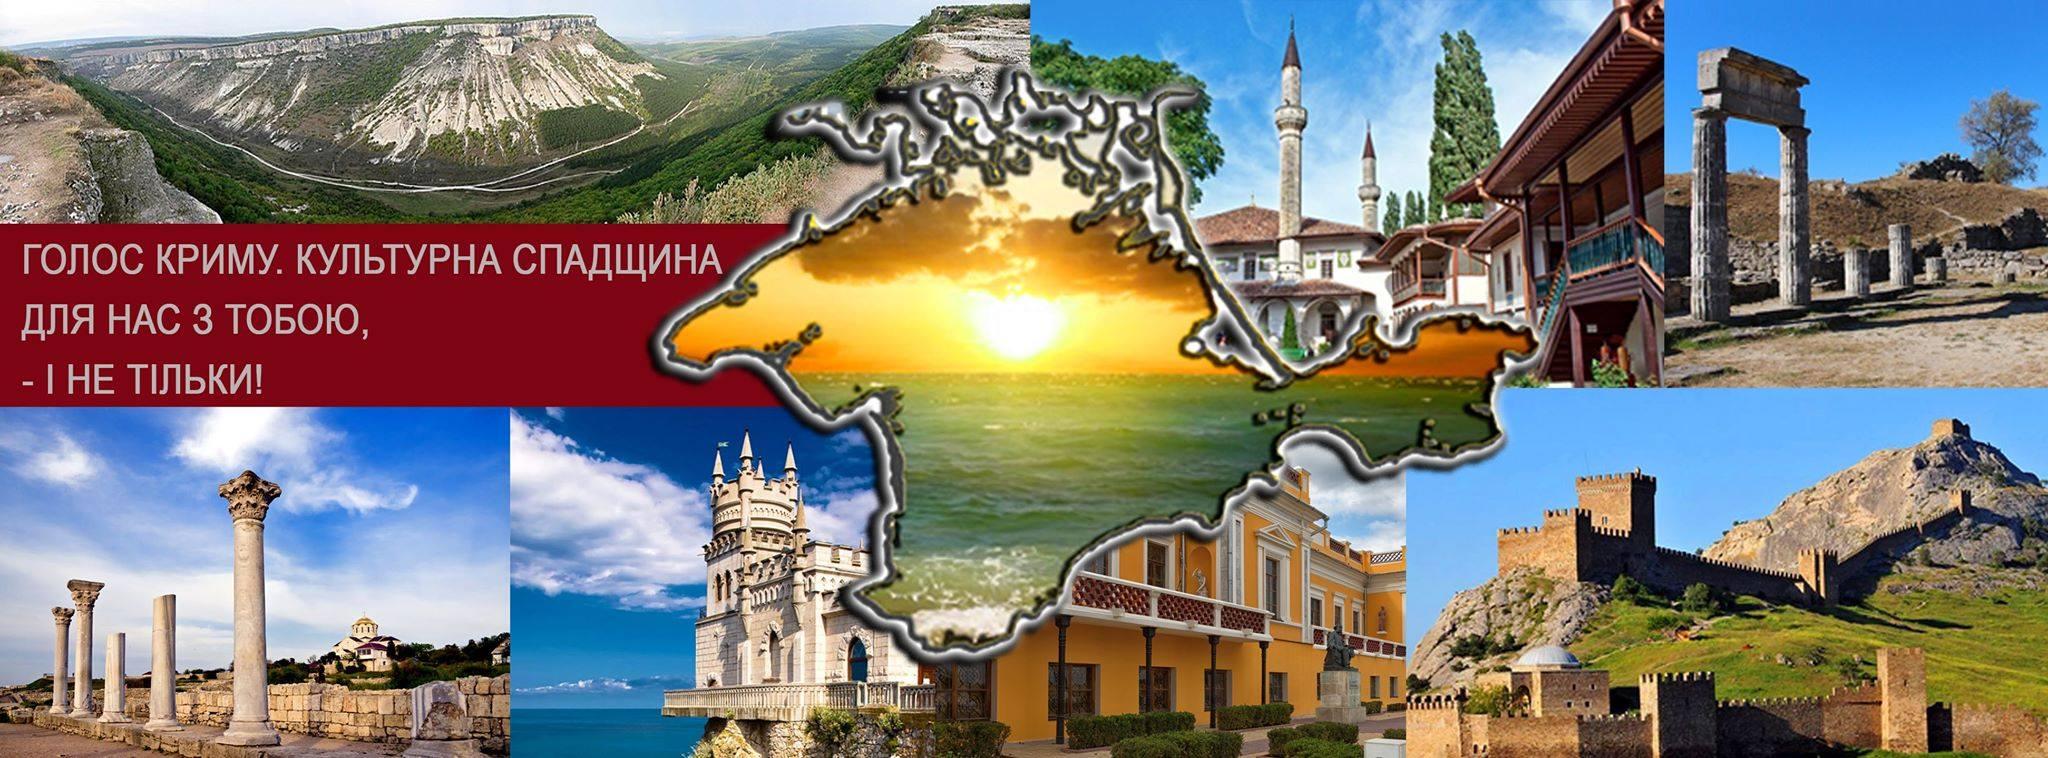 "The project ""Voice of Crimea. Culture"""